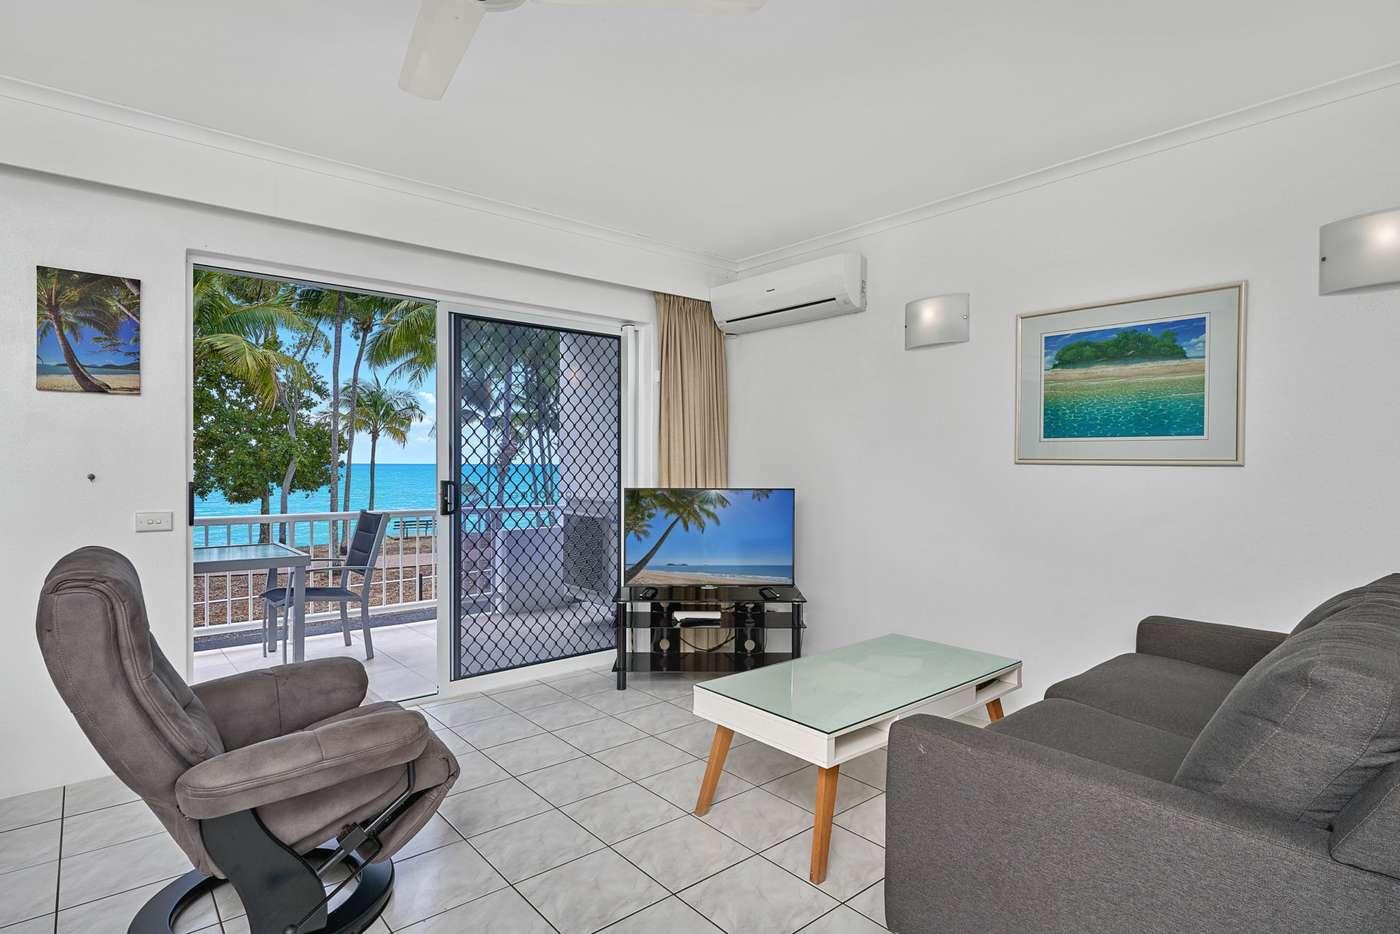 Seventh view of Homely unit listing, 12/69-73 Arlington Esplanade, Clifton Beach QLD 4879